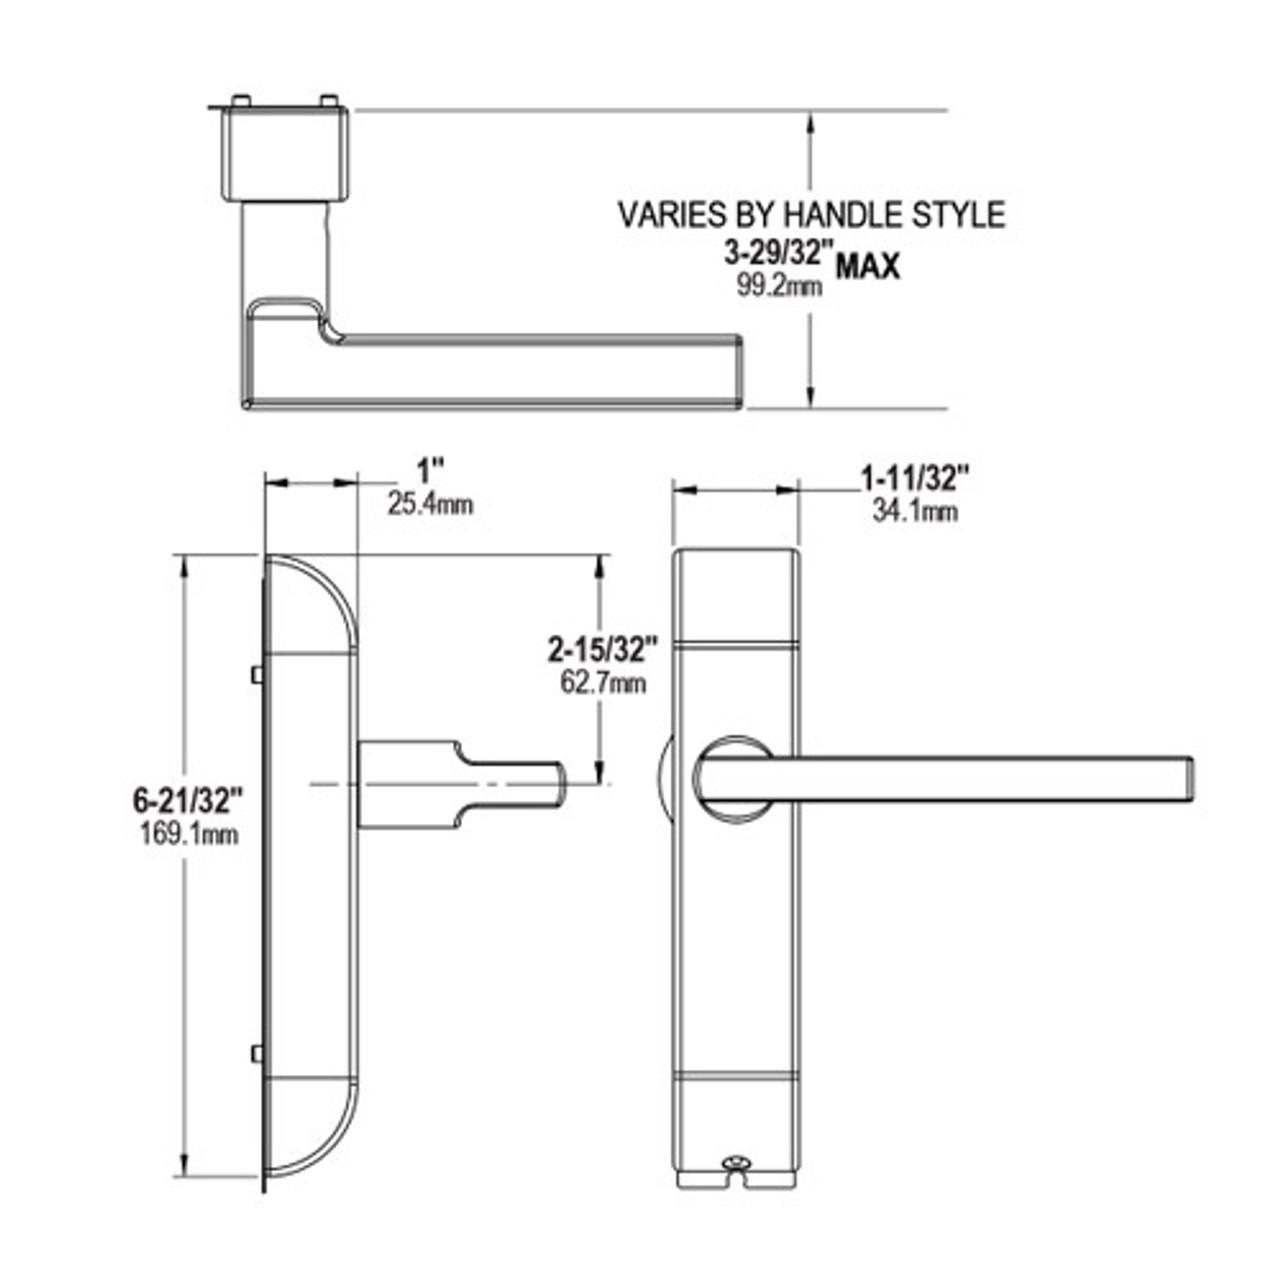 4600M-MW-521-US3 Adams Rite MW Designer handle Dimensional View